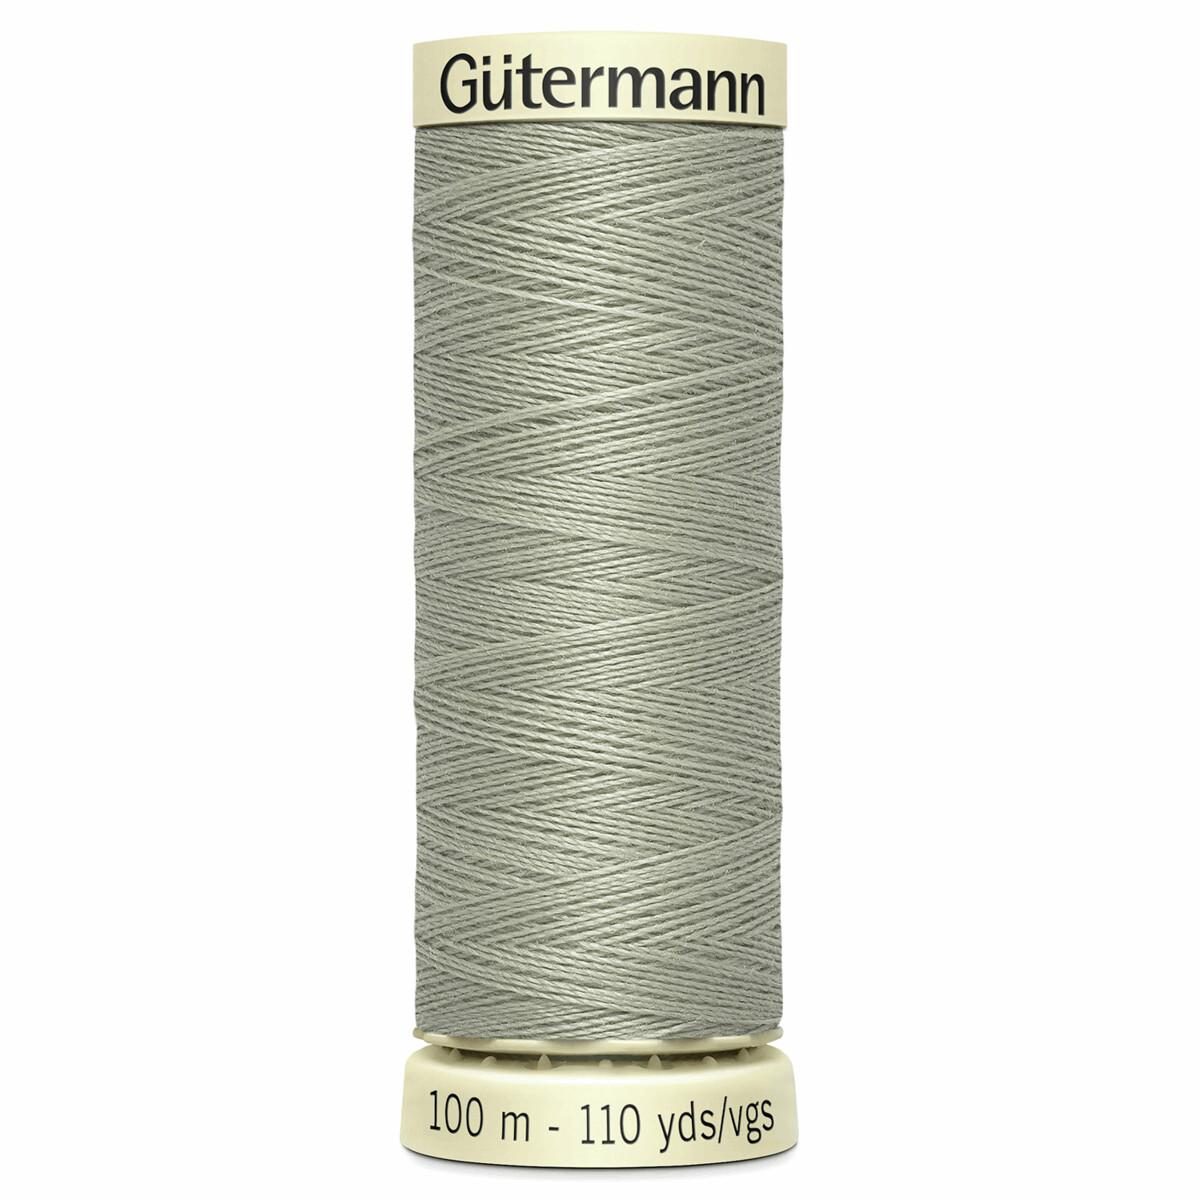 Gutermann Sew-All thread 132